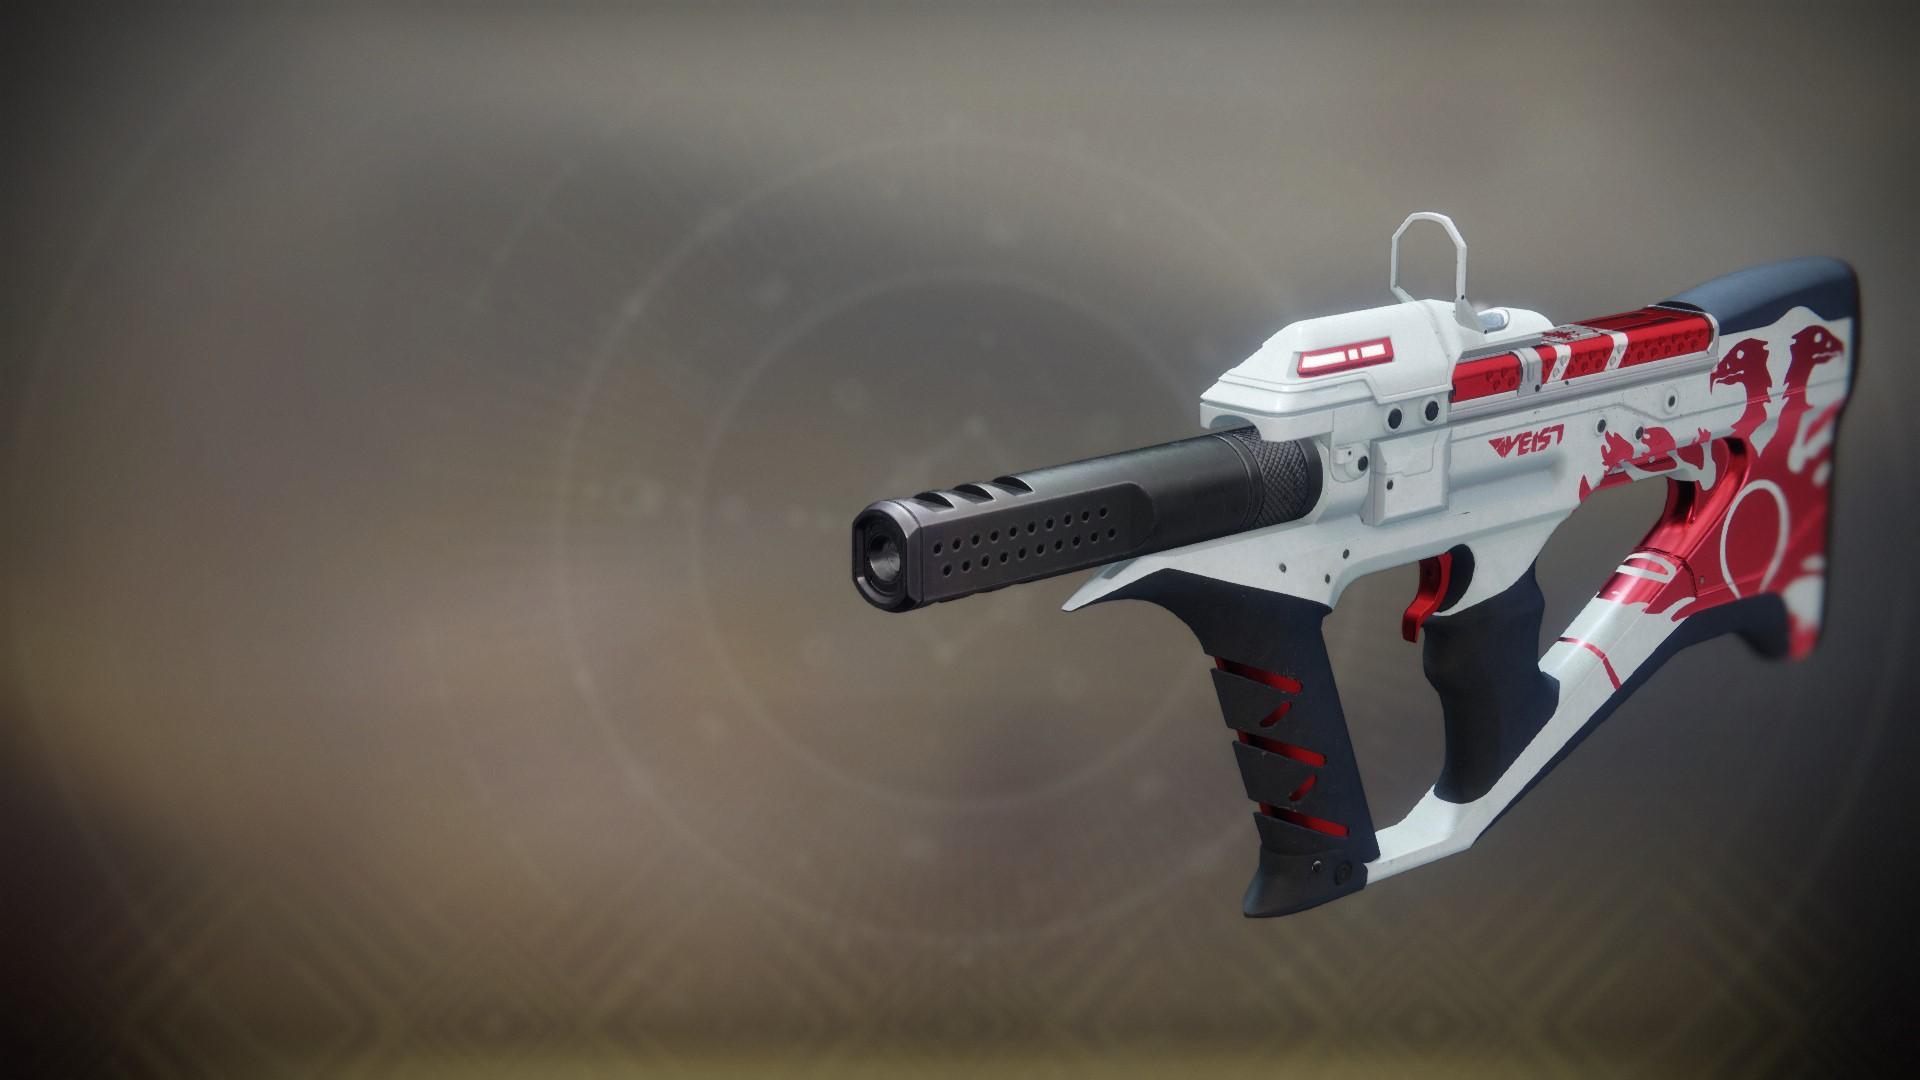 The Recluse - Destiny 2 Legendary Submachine Gun - Possible